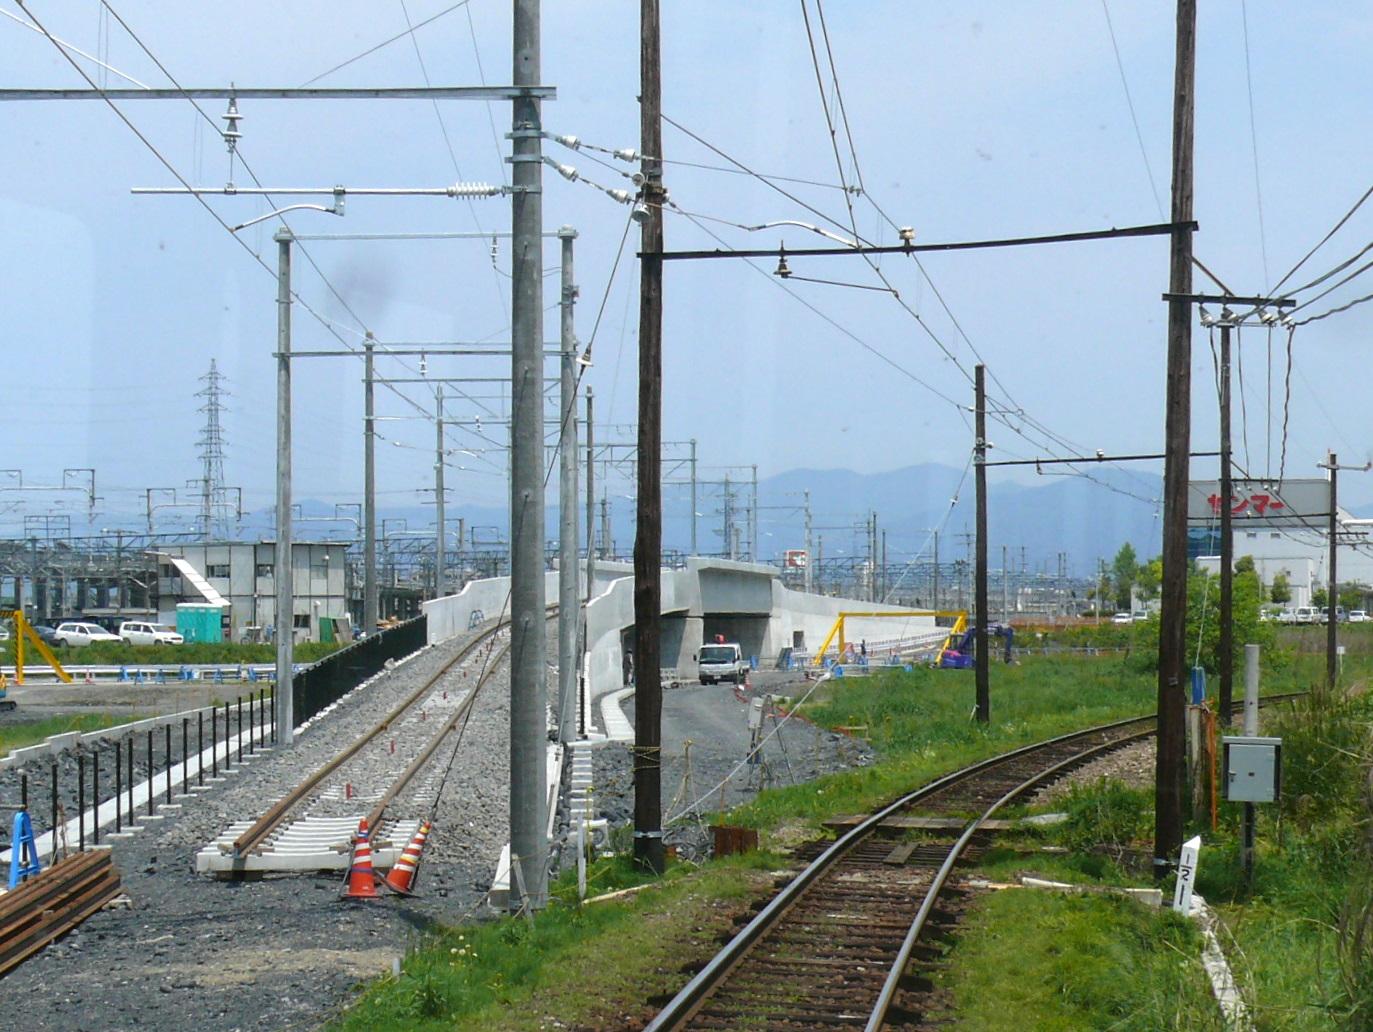 https://upload.wikimedia.org/wikipedia/commons/3/3b/Ohmi_Railway_Main_Line_New_line_switch_construction.JPG